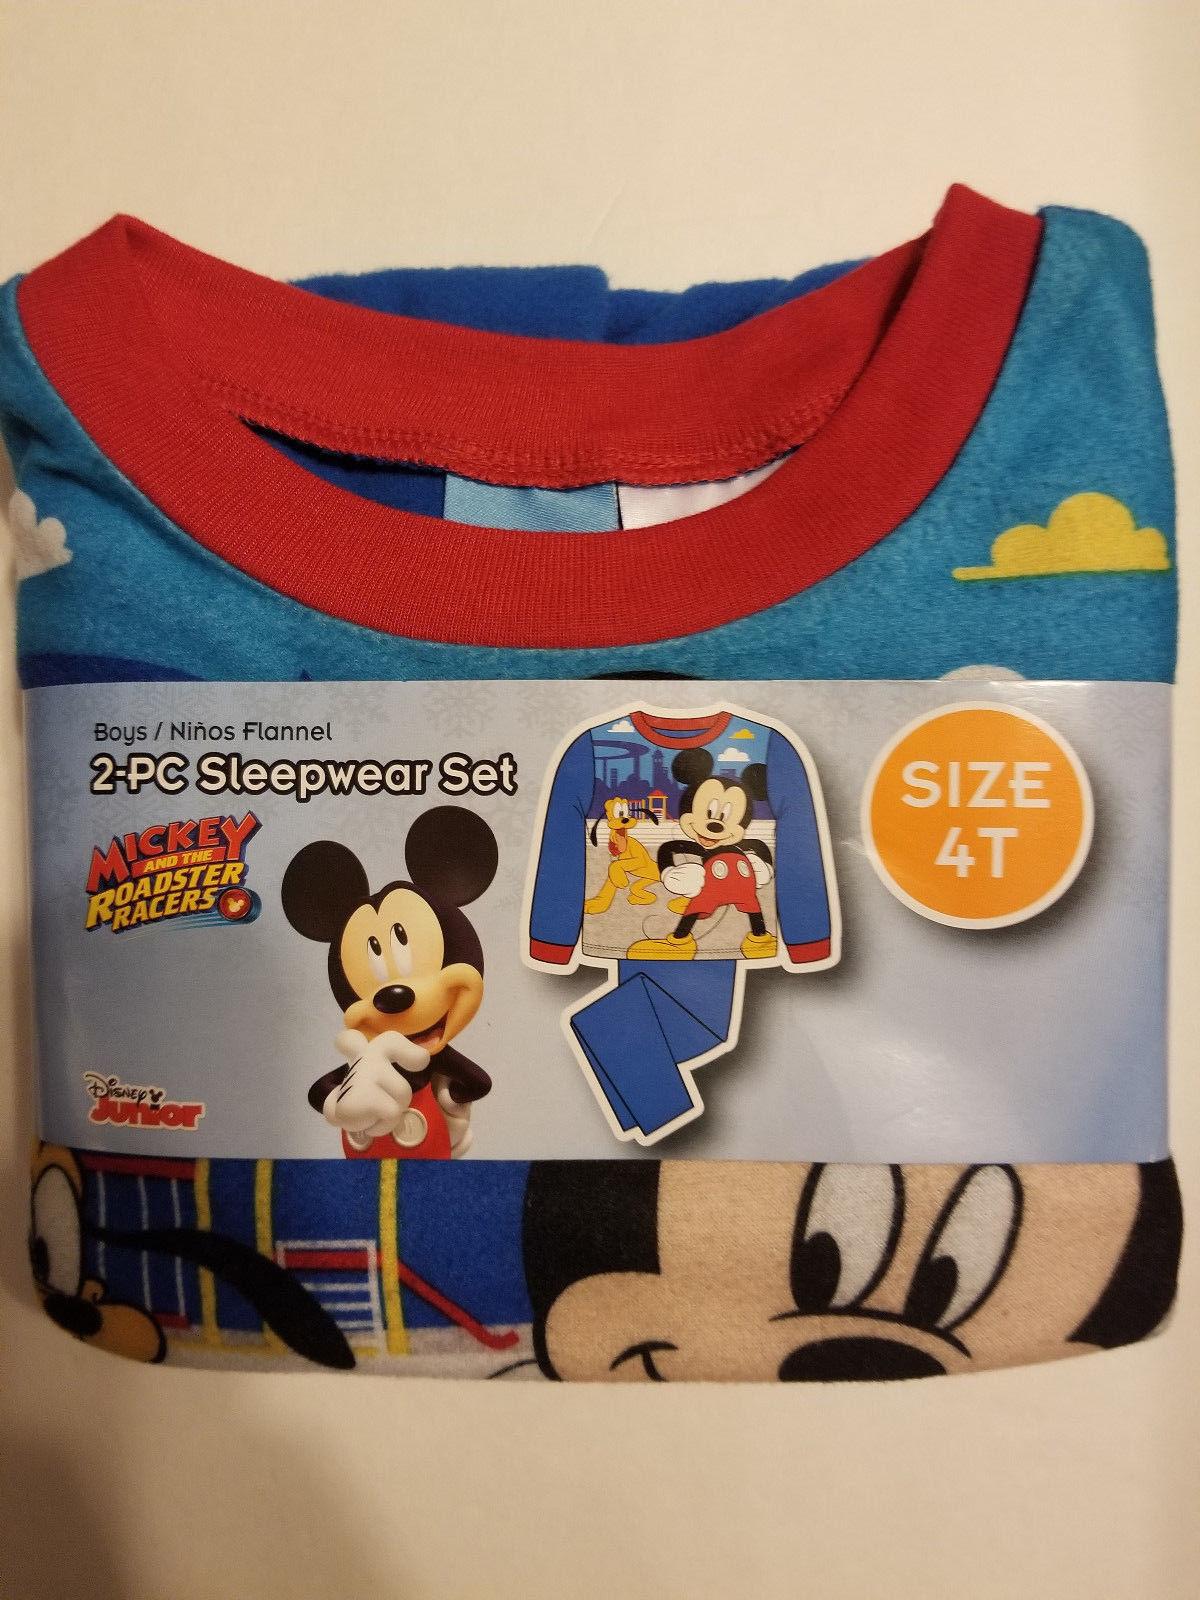 3T BATMAN DC Basic Fleece Pajamas Sleepwear Set NWT Toddler/'s Size 2T 4T or 5T